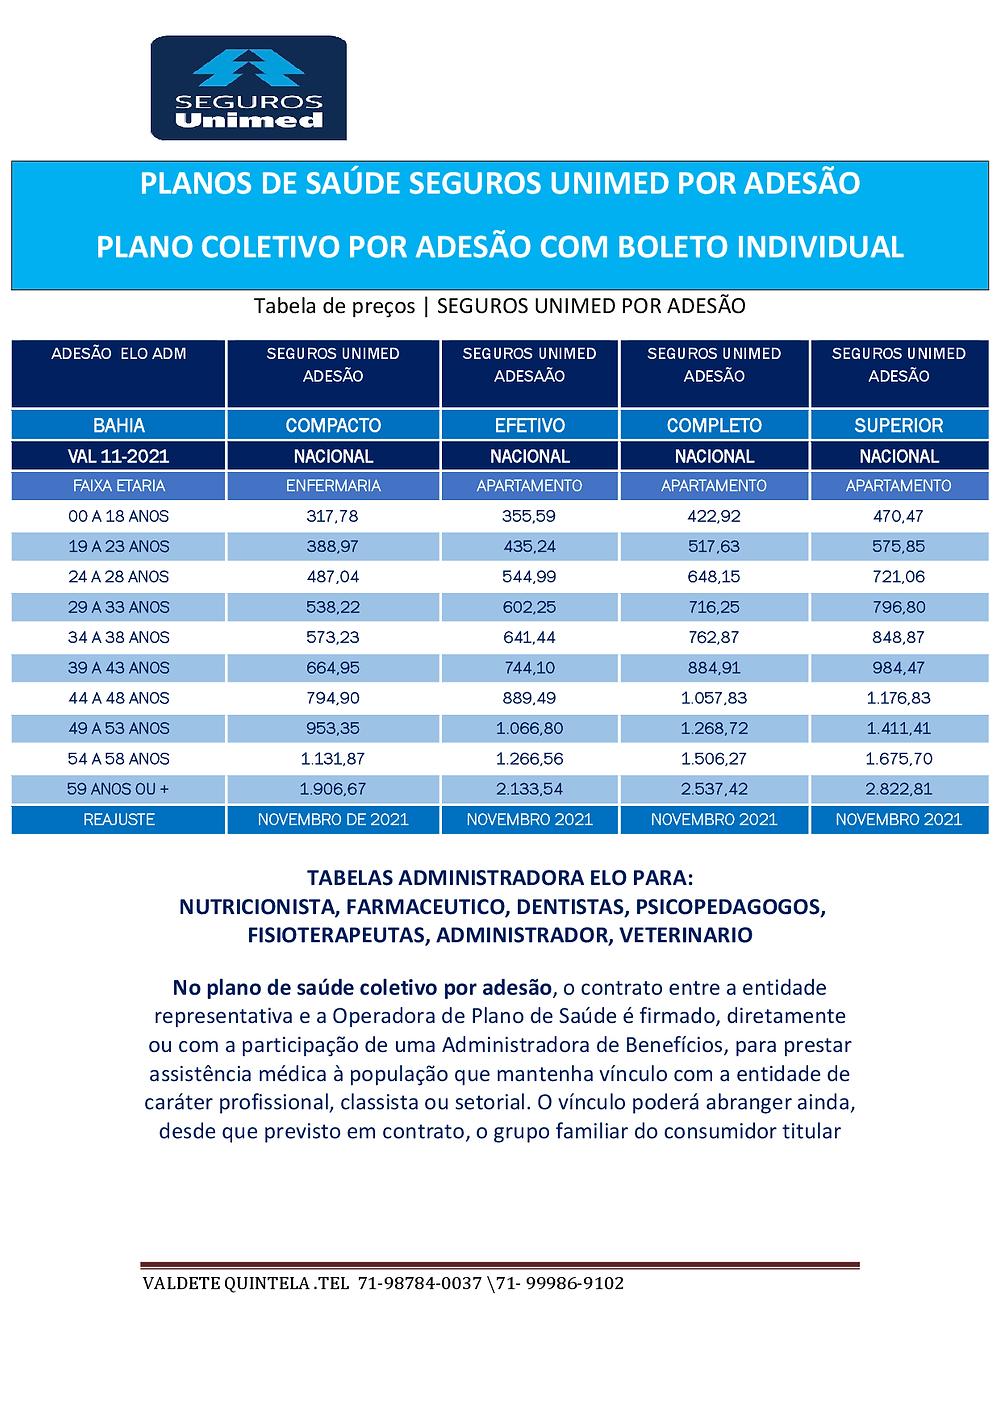 Seguros Unimed - Tabelas Elo Administradora - Salvador